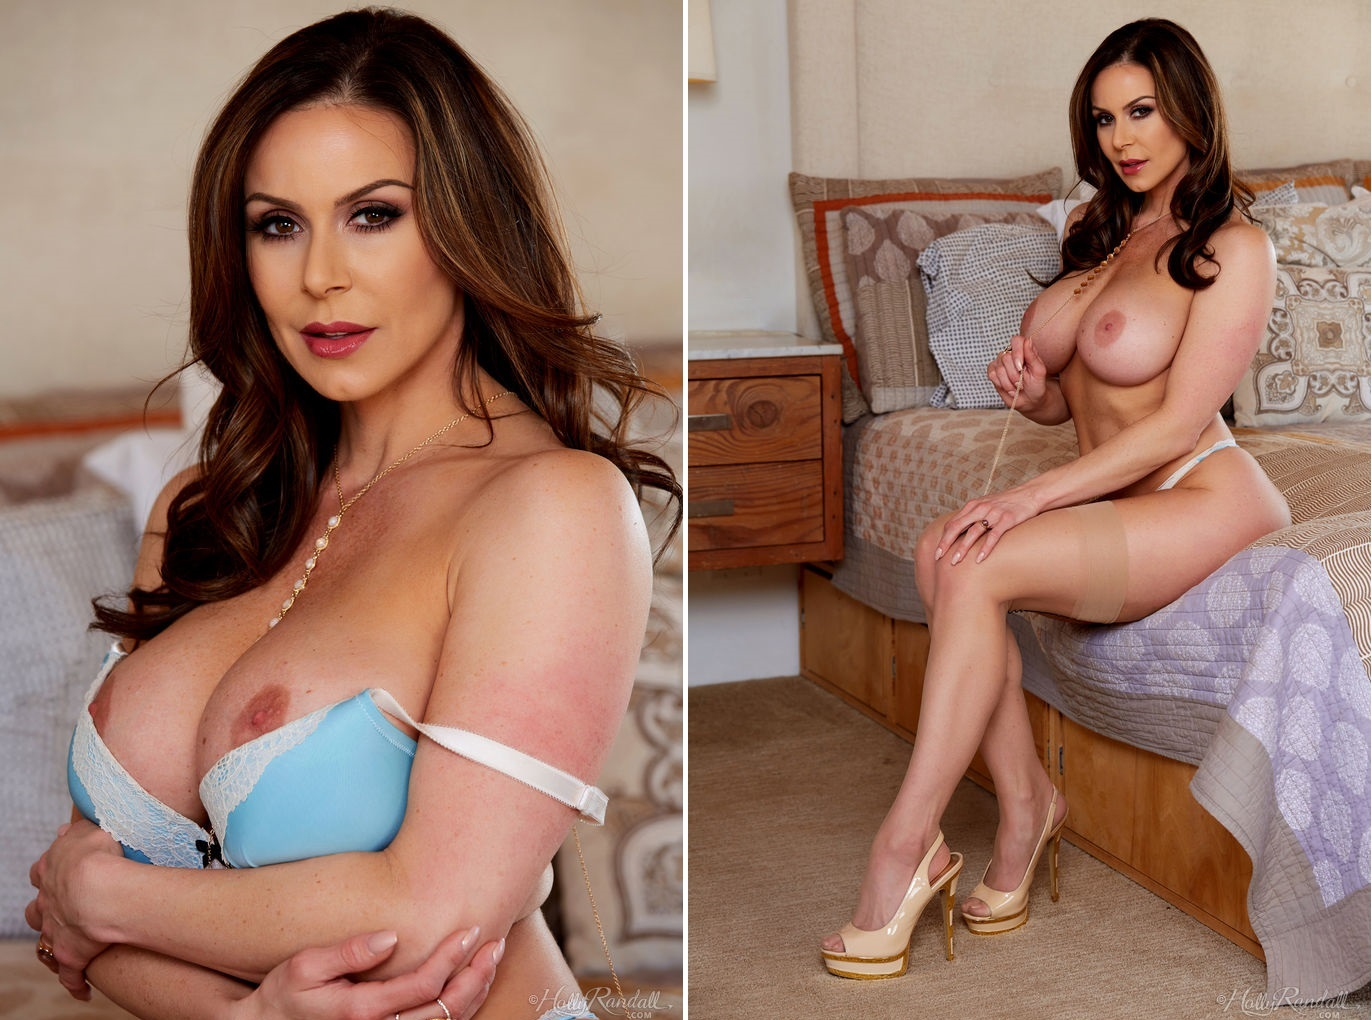 Kendra Lust videos OnlyFans